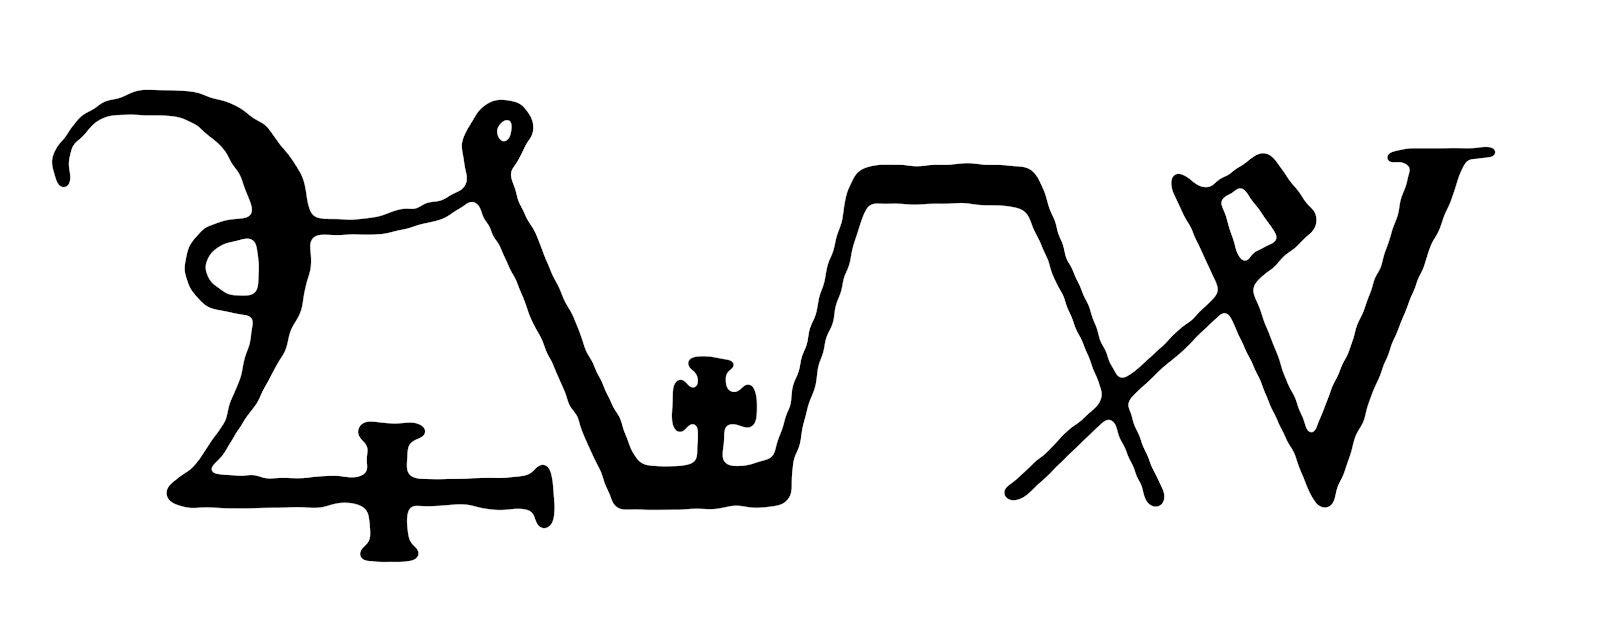 archangel symbols michael sun demons symbology